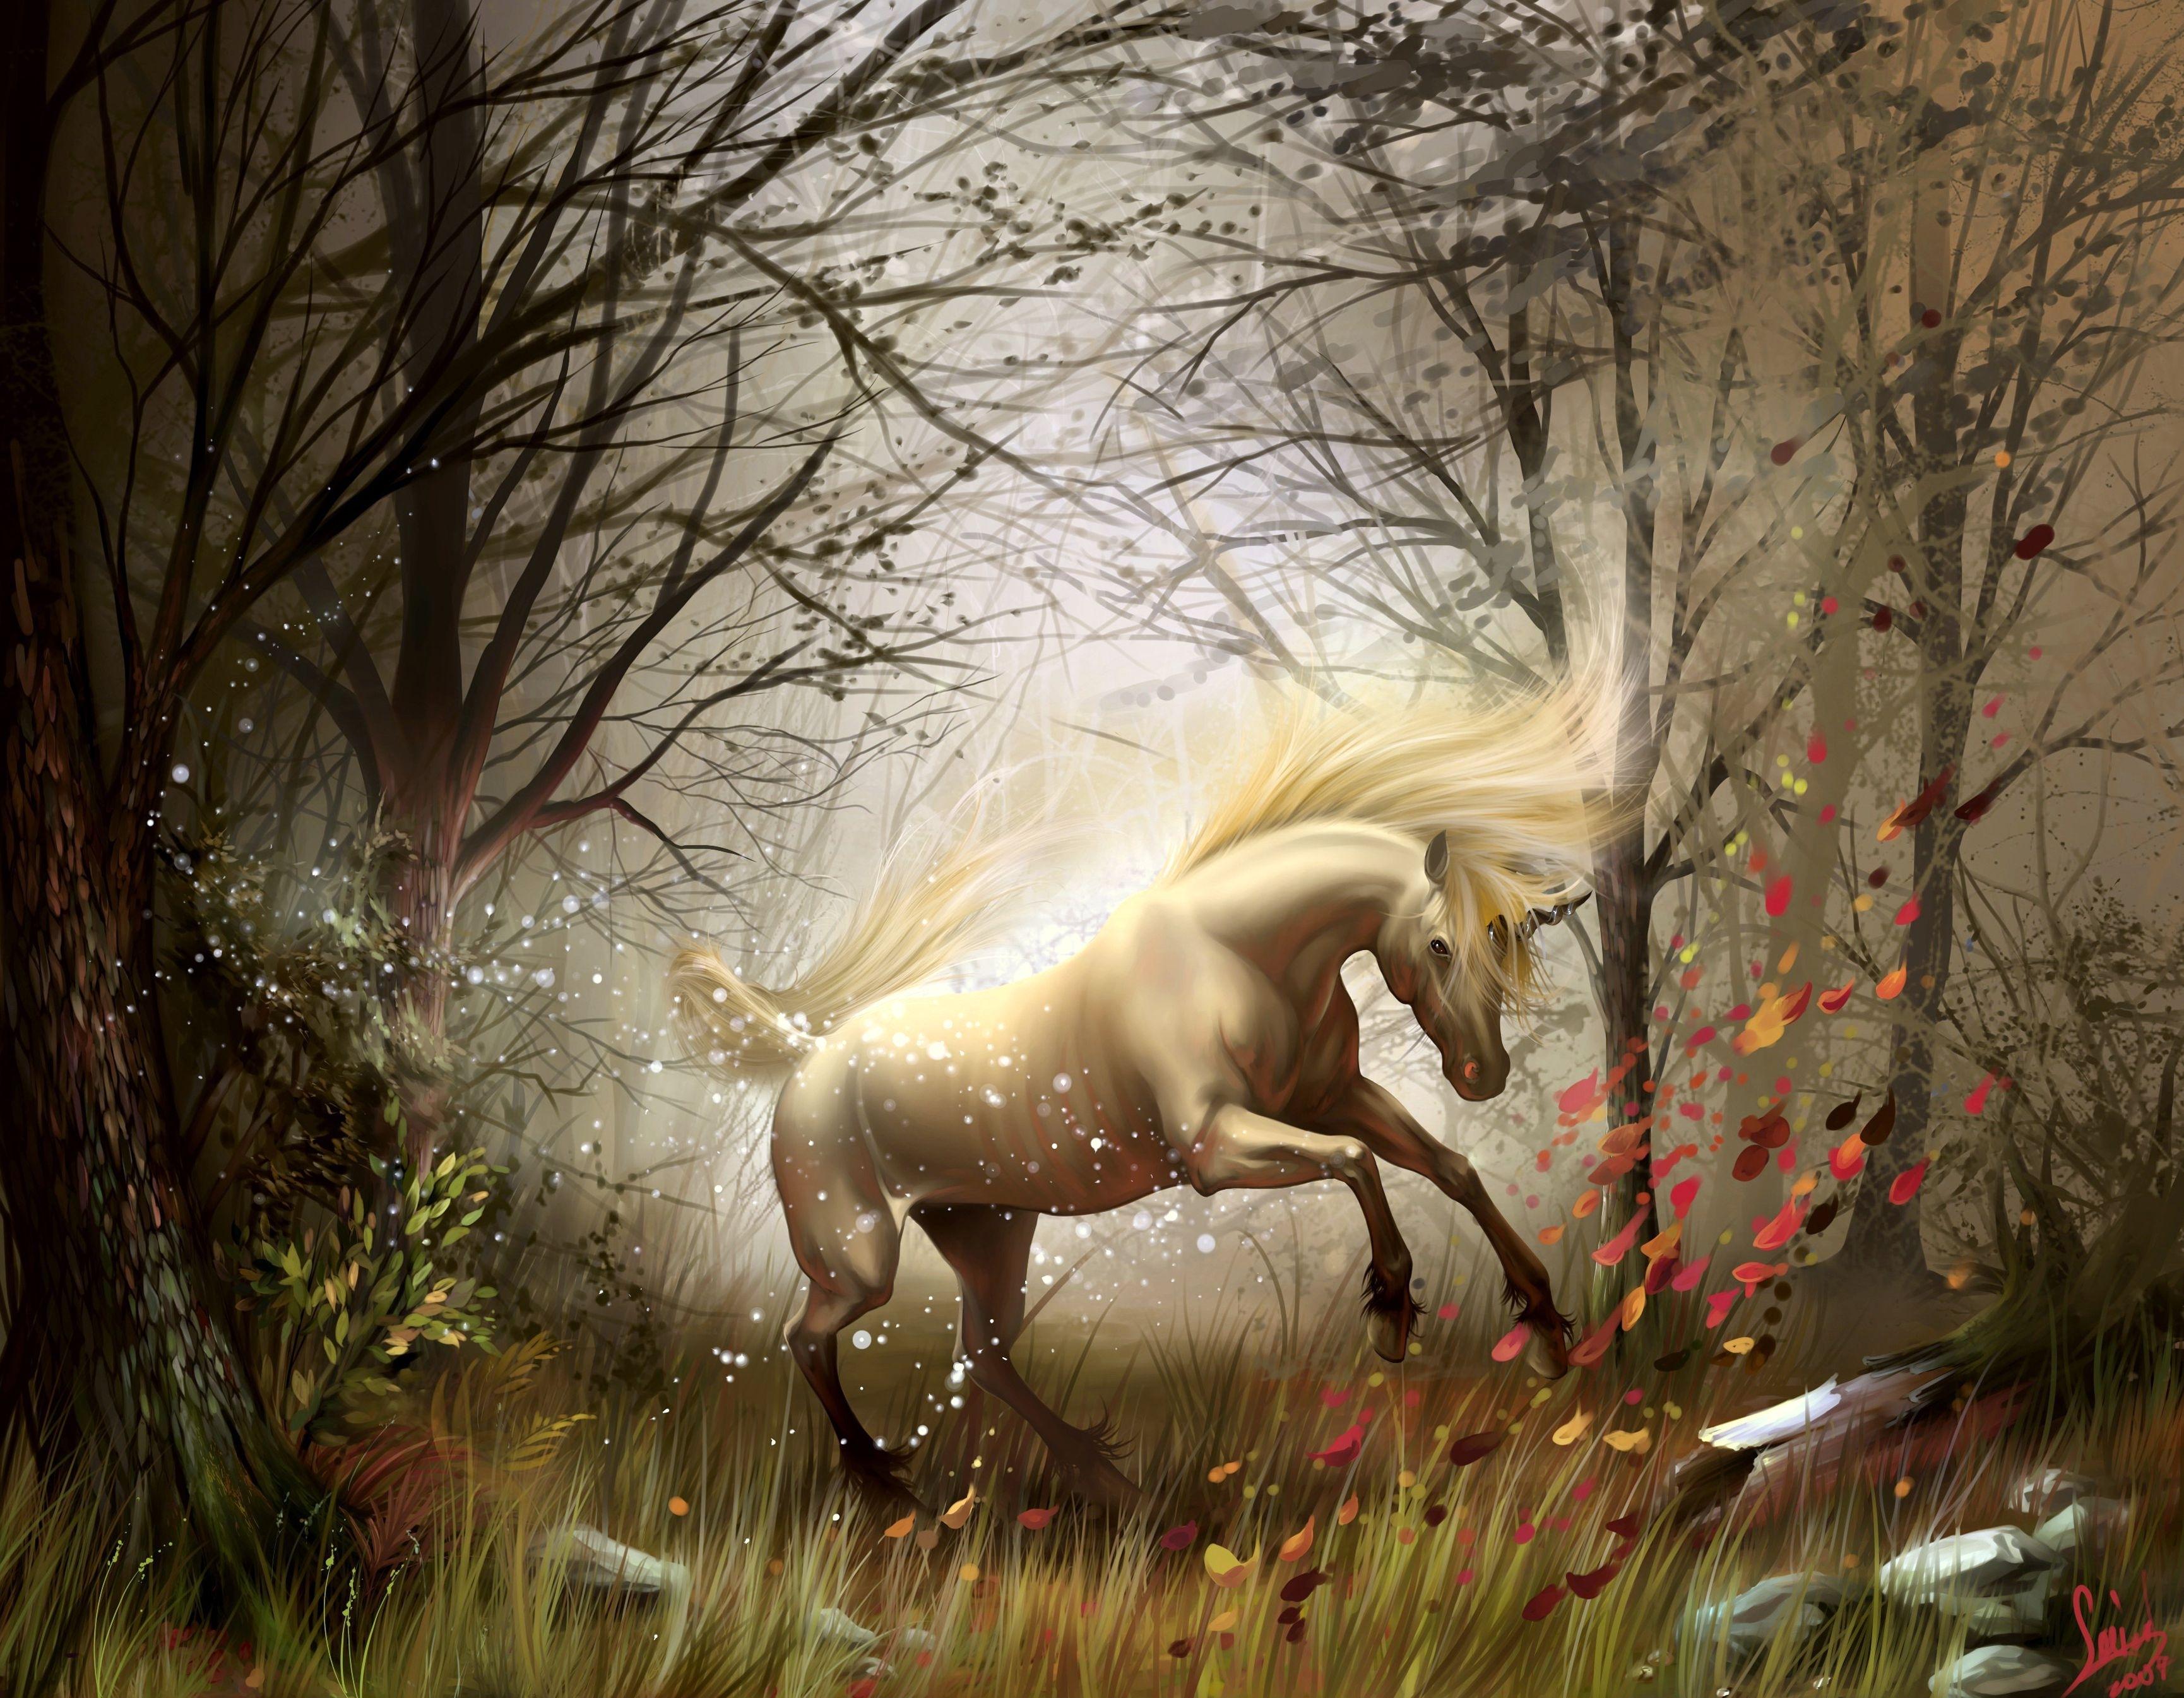 Fantasy   Unicorn Wallpaper 3460x2690